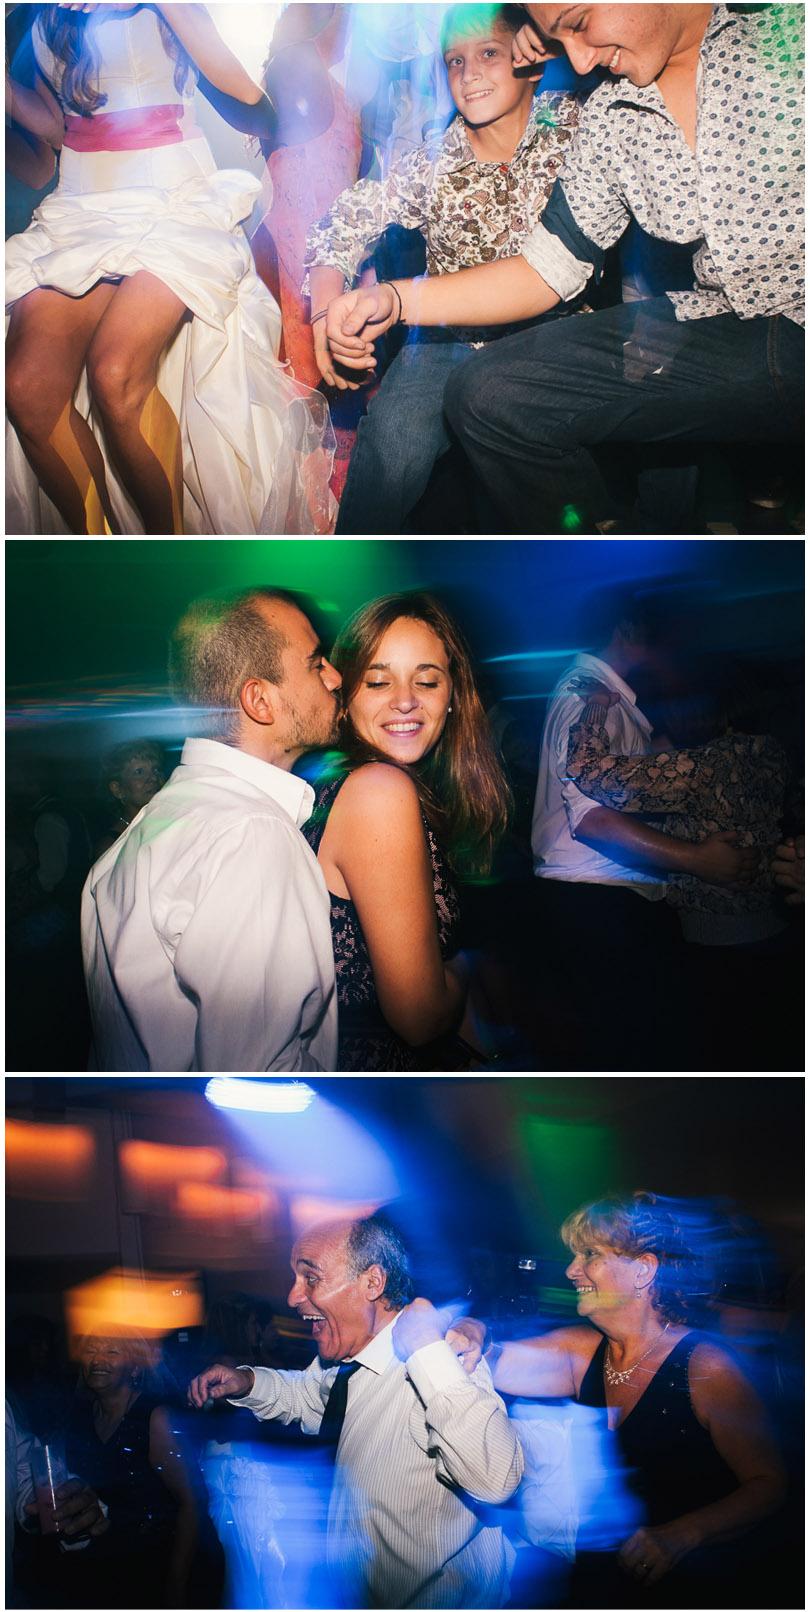 fotografos de casamientos cordoba argentina (9).jpg